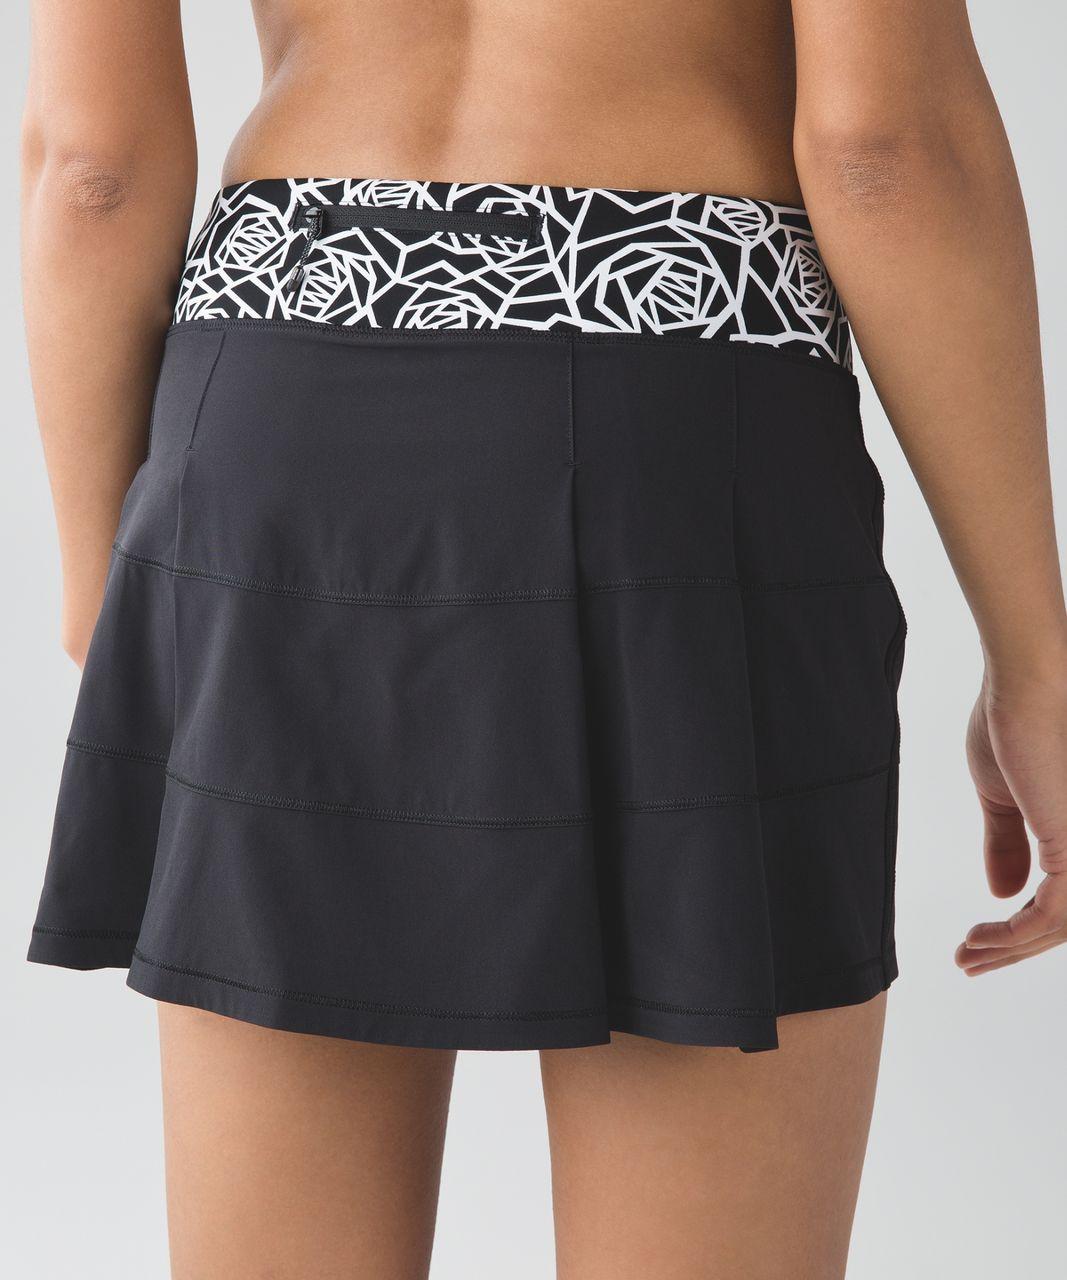 Lululemon Pace Rival Skirt II (Tall) - Black / Posey Black White